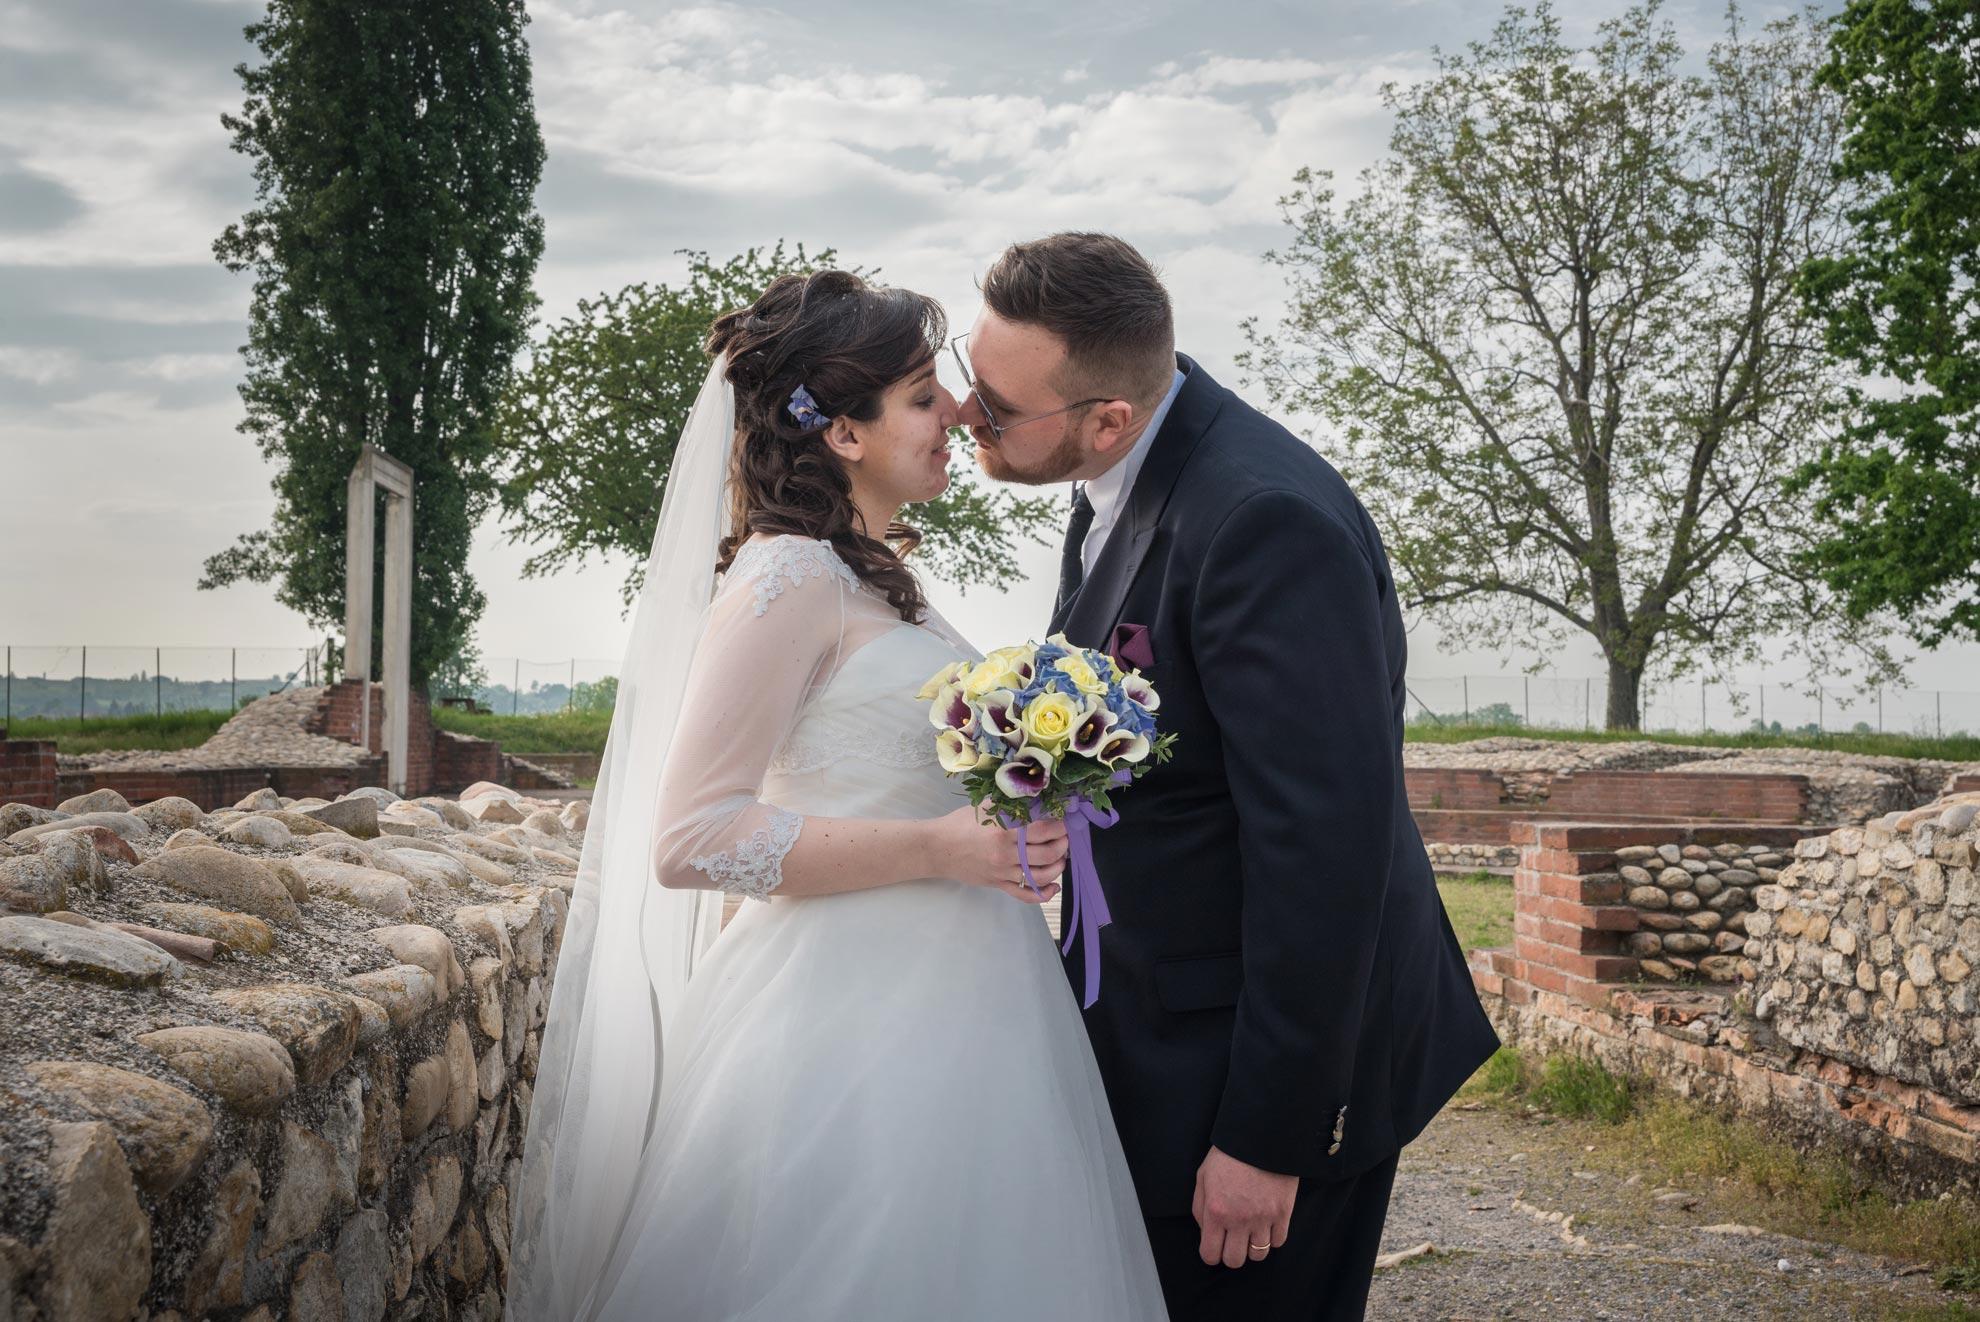 Matrimonio a Narzole Lorenza Diego - DSC 3192 - Fotografo matrimonio Piemonte - Fotografo matrimonio Piemonte